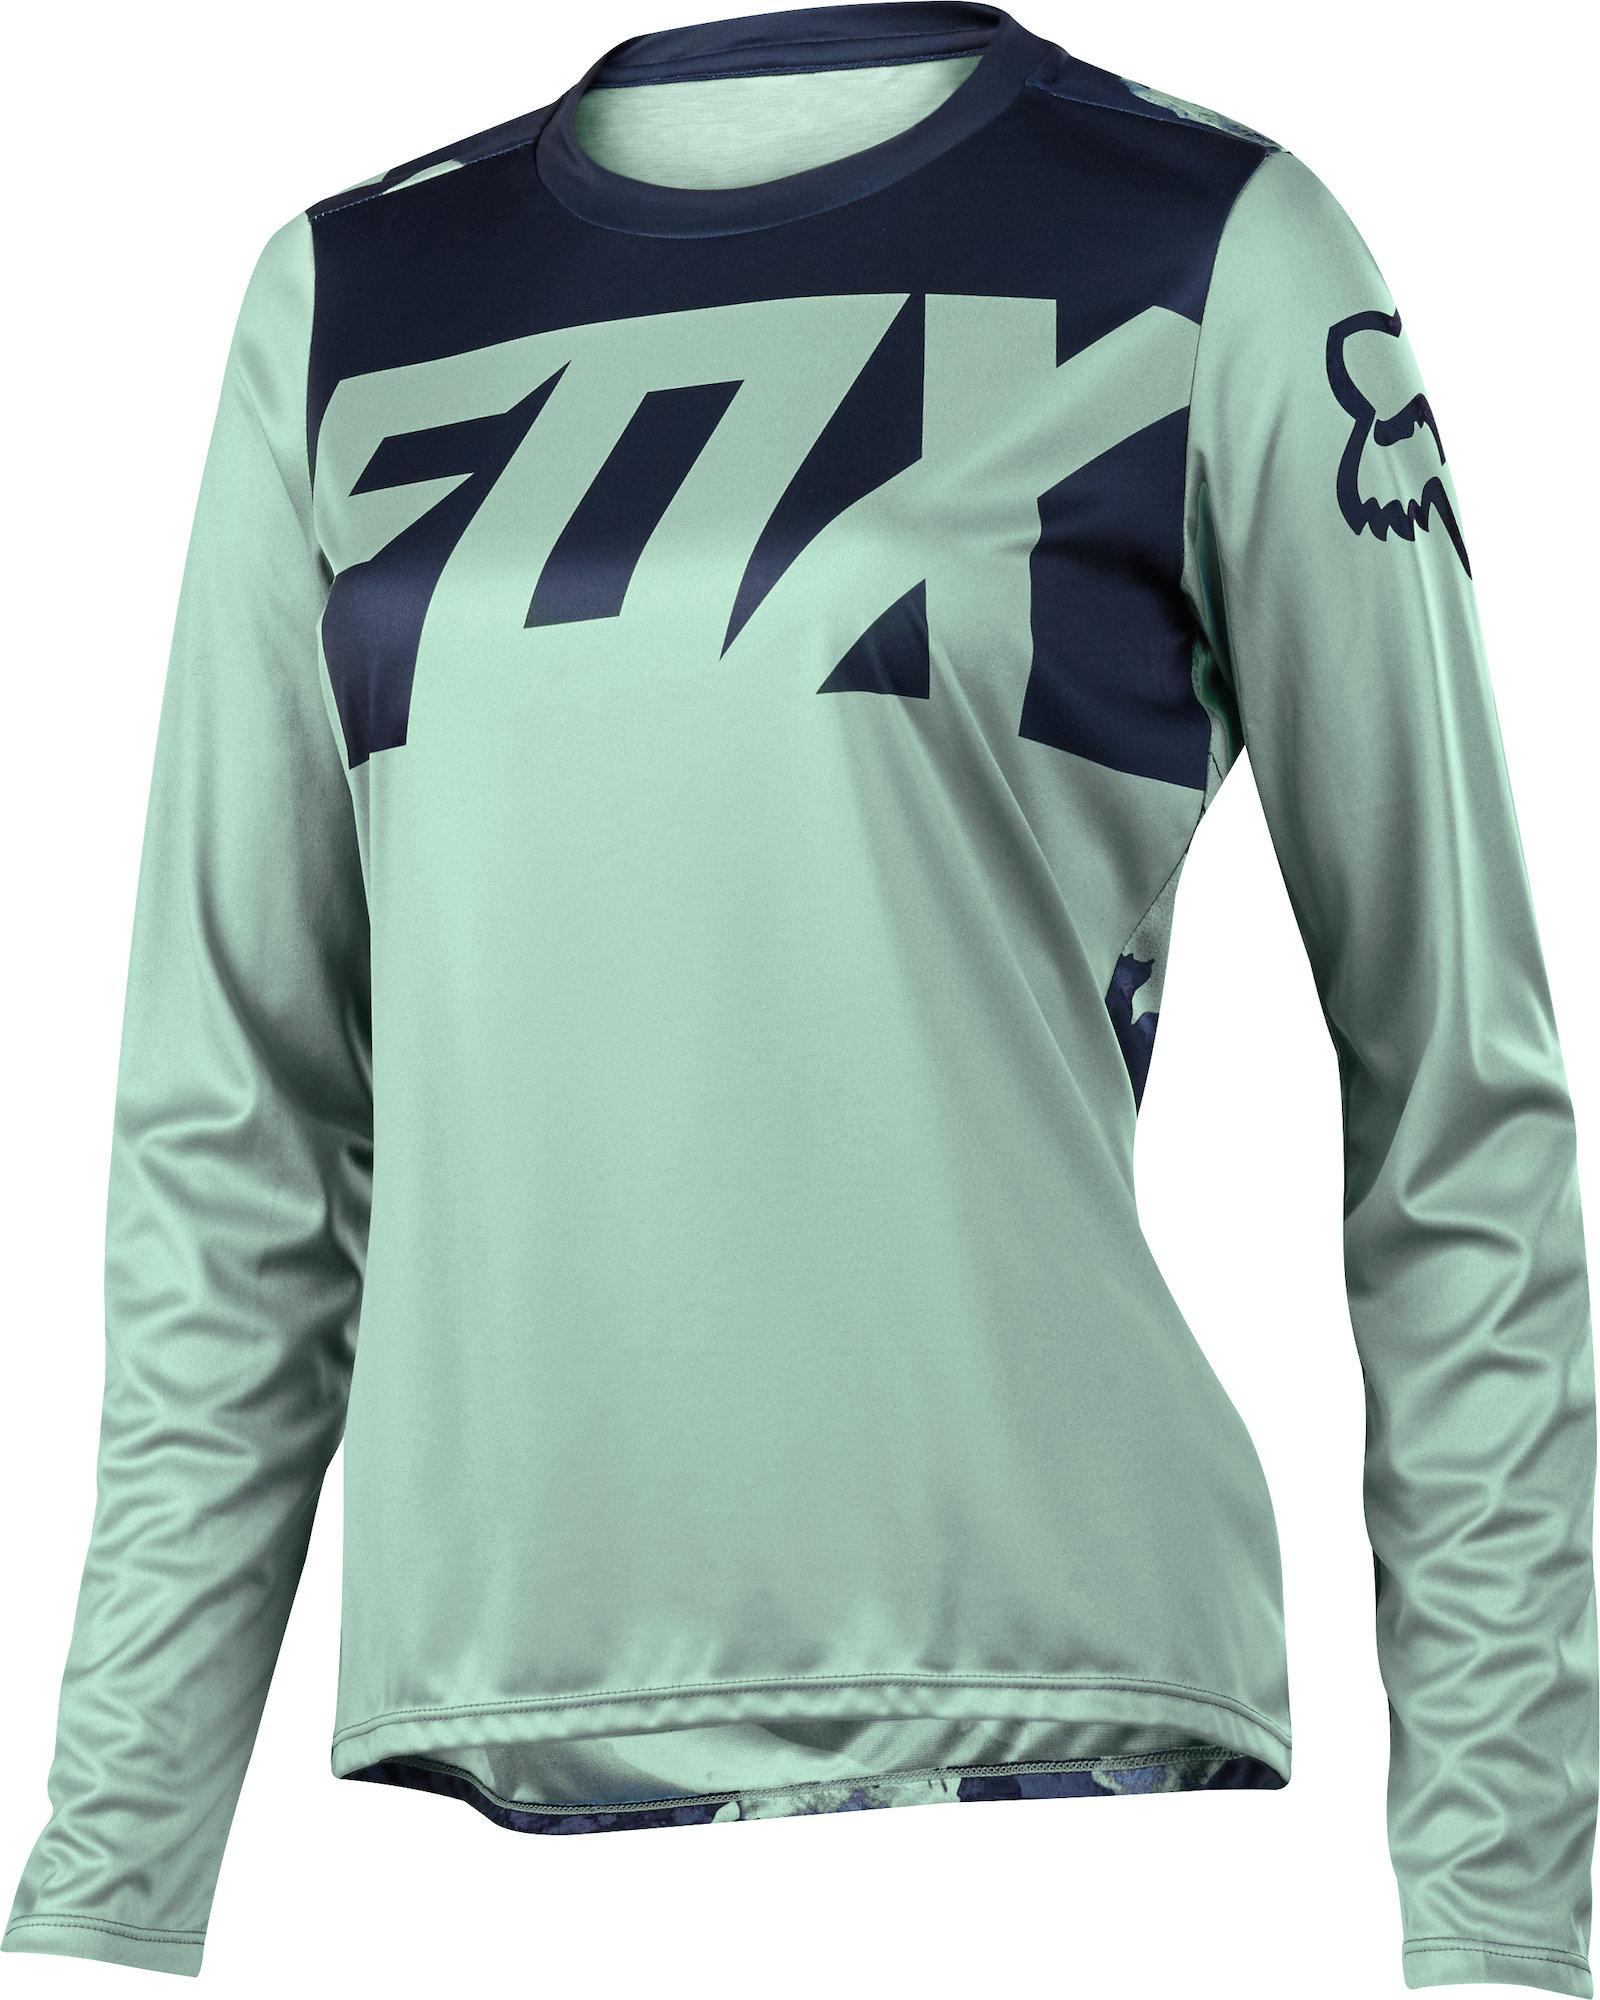 0be29435fe60 Fox Racing Women's Ripley Long Sleeve Jersey - SV Cycle Sport ...